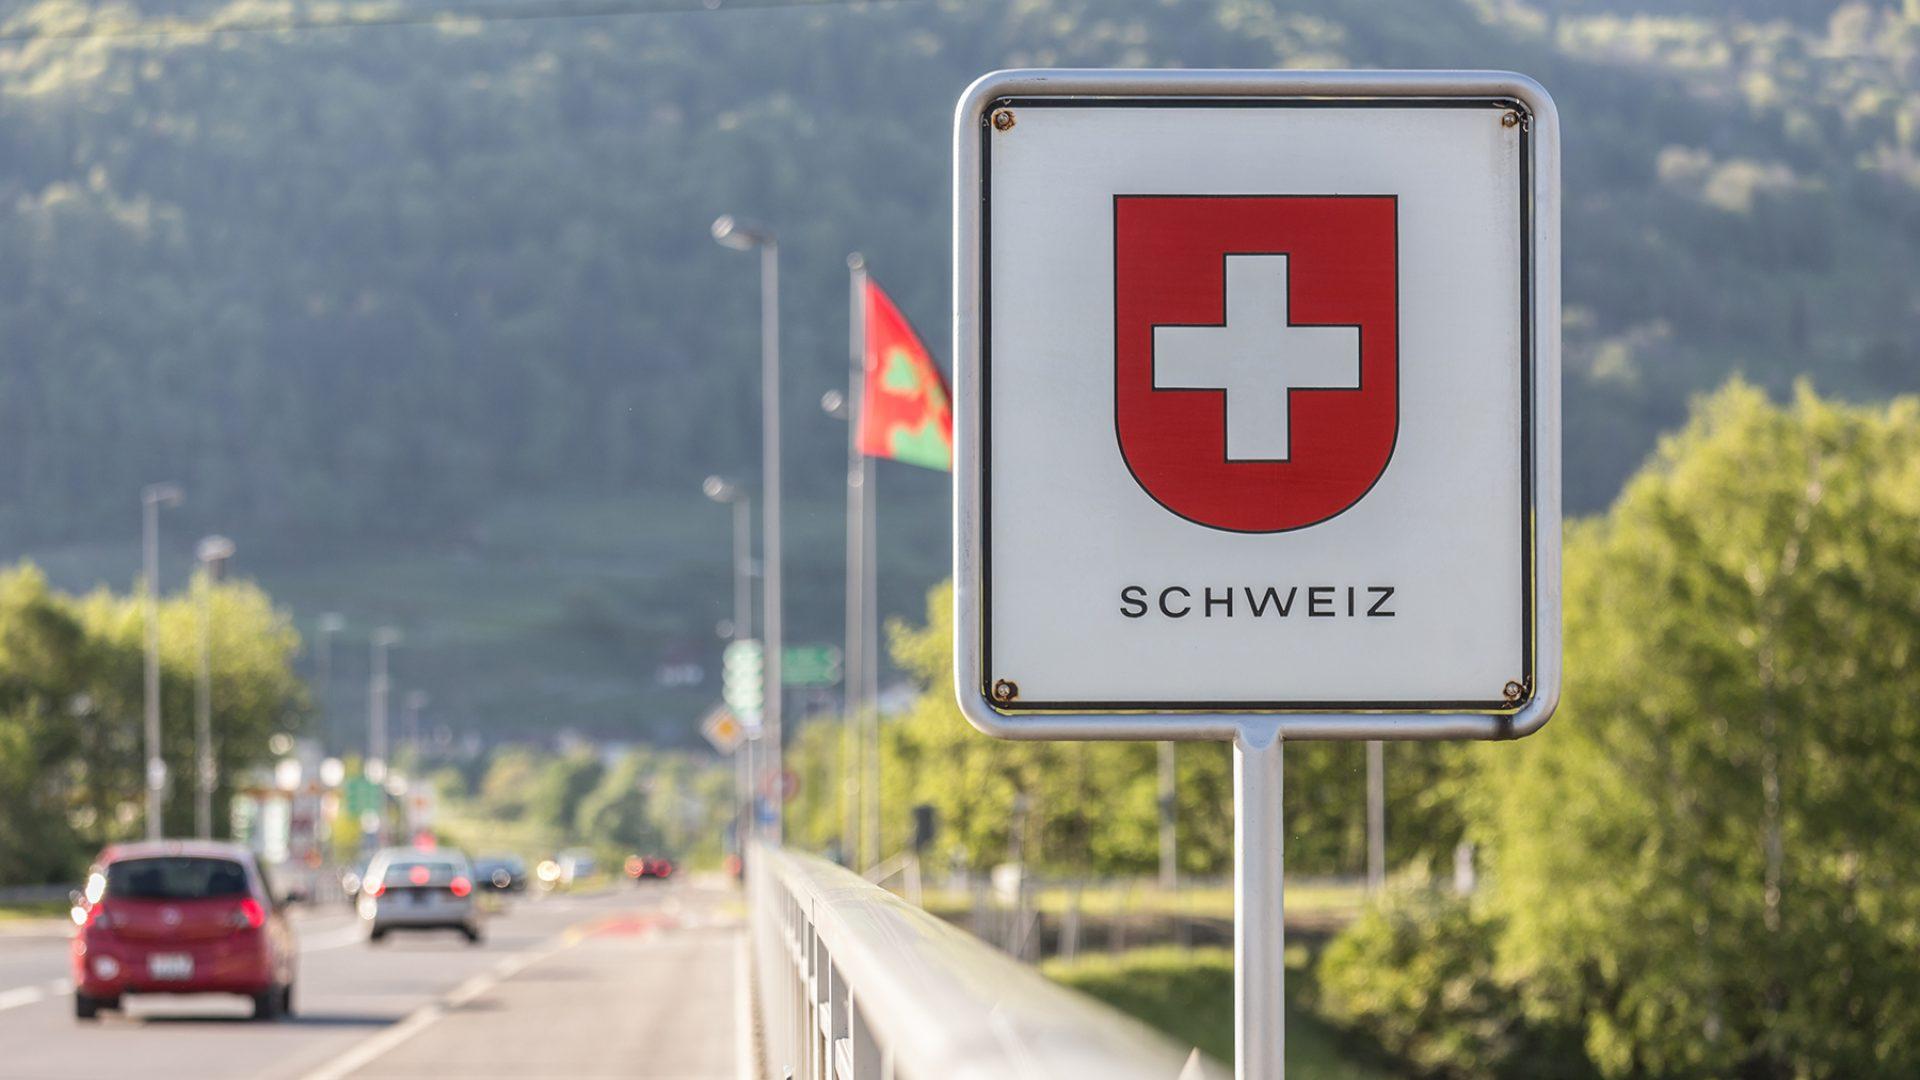 Relocating to Switzerland